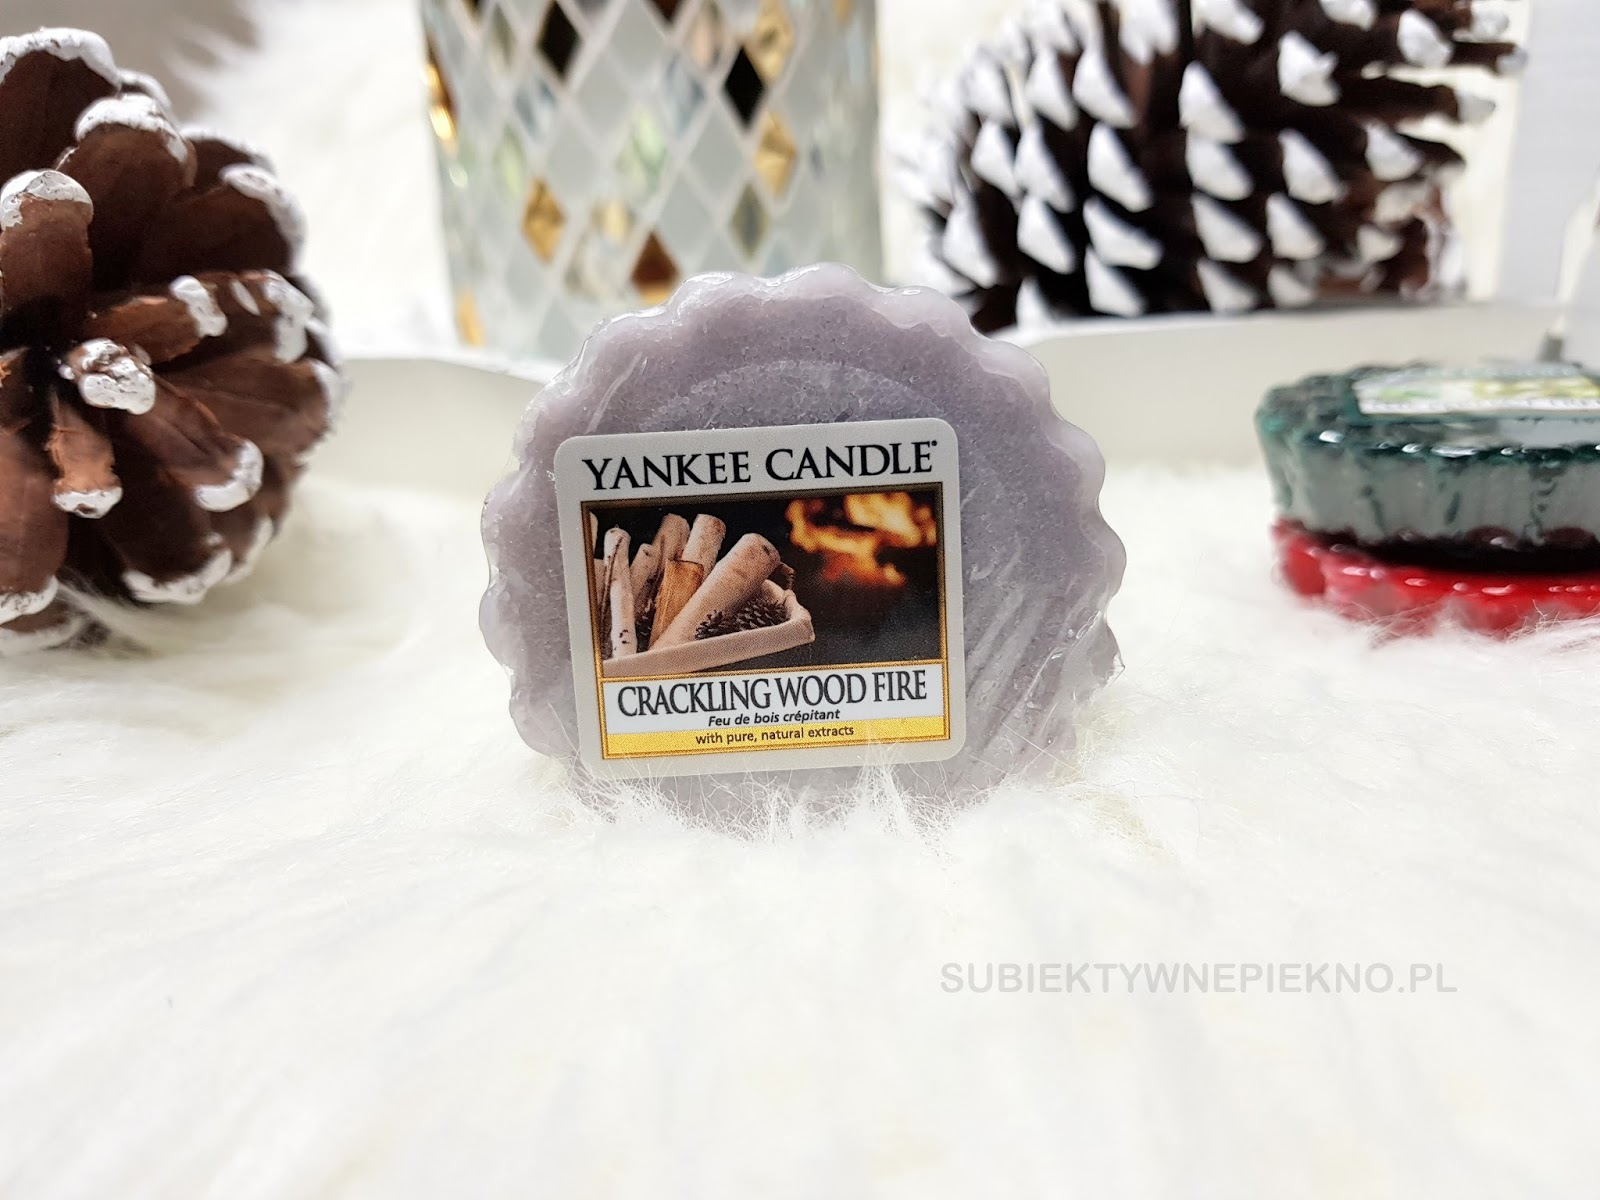 Wosk zapachowy Crackling Wood Fire Yankee Candle. Zimowa kolekcja Q4 2017